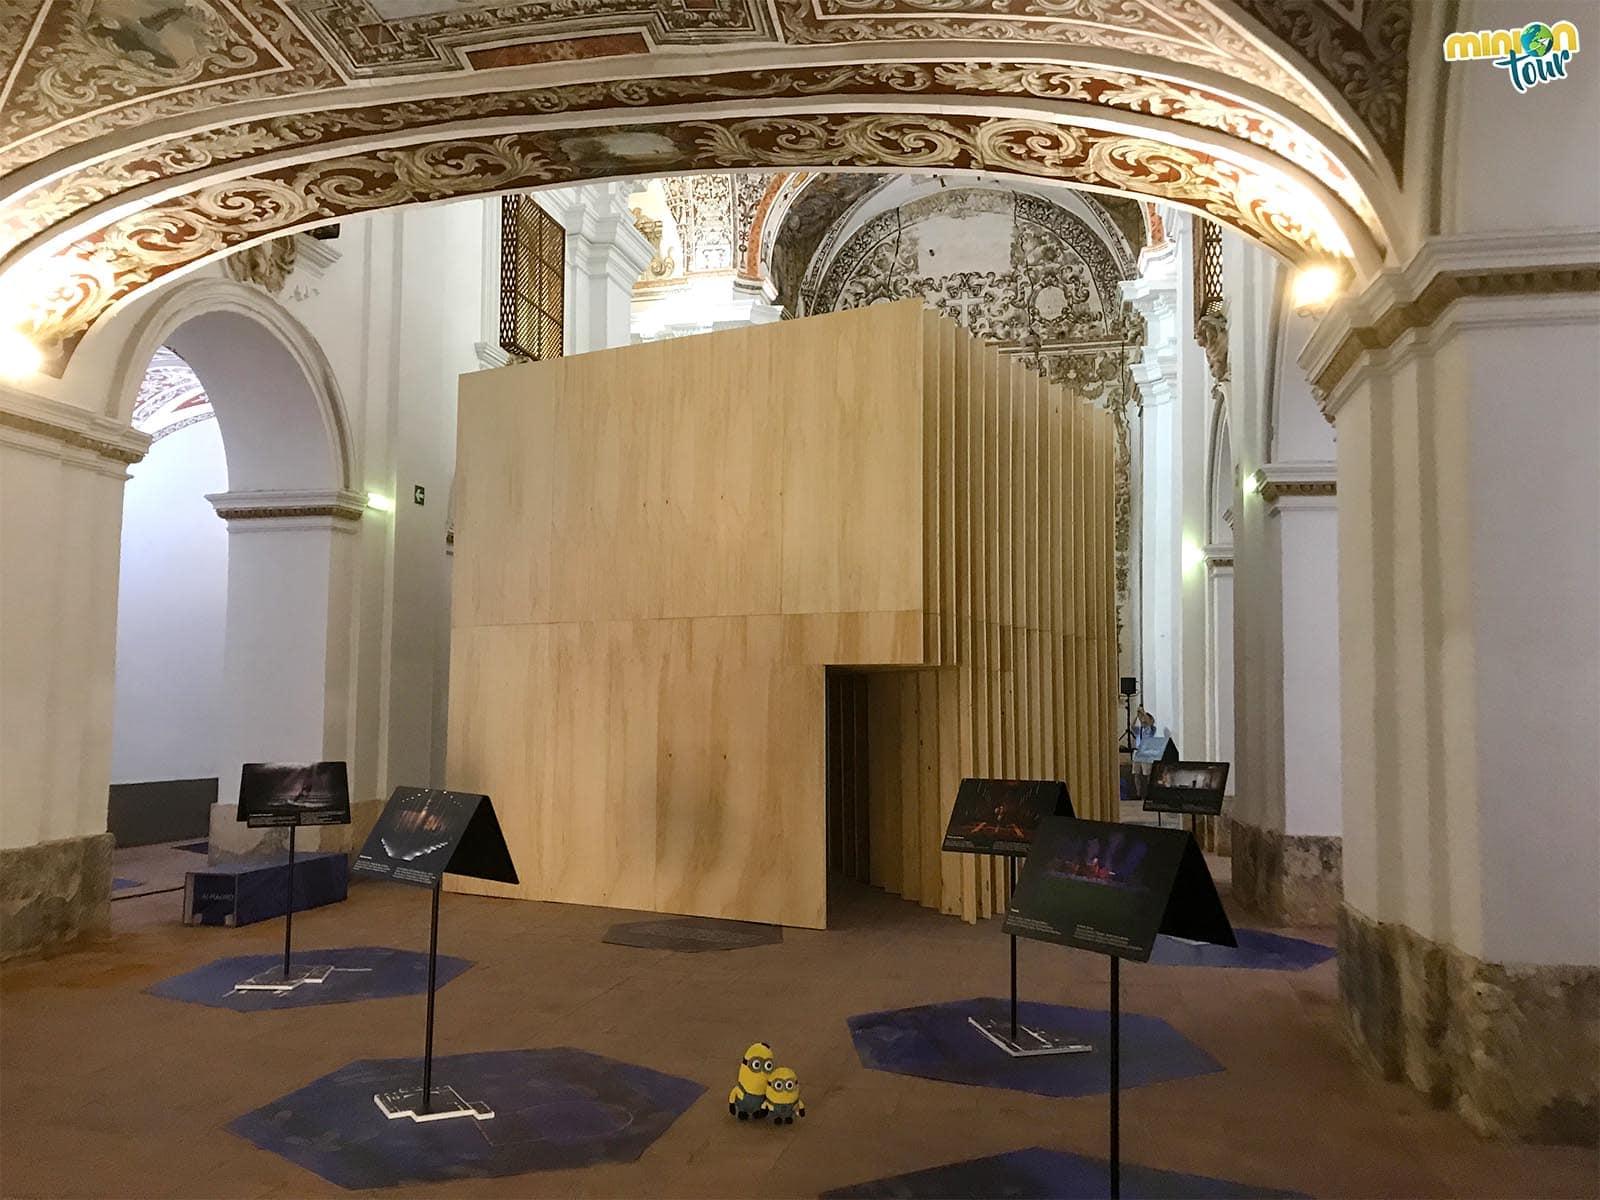 Exposición dentro de la Iglesia de San Agustín durante el Festival de Teatro Clásico de Almagro